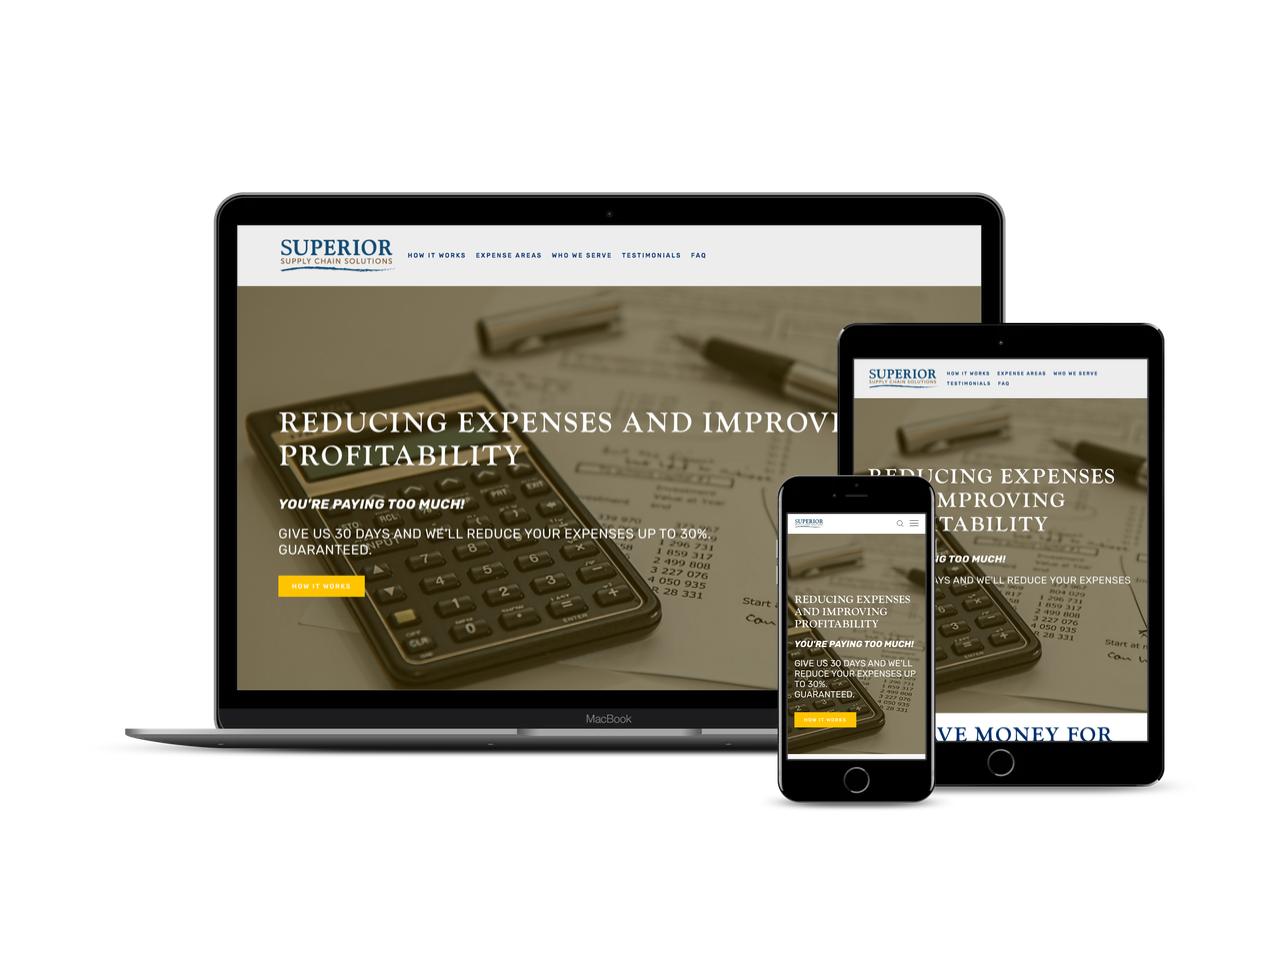 minneapolis-website-design.jpg